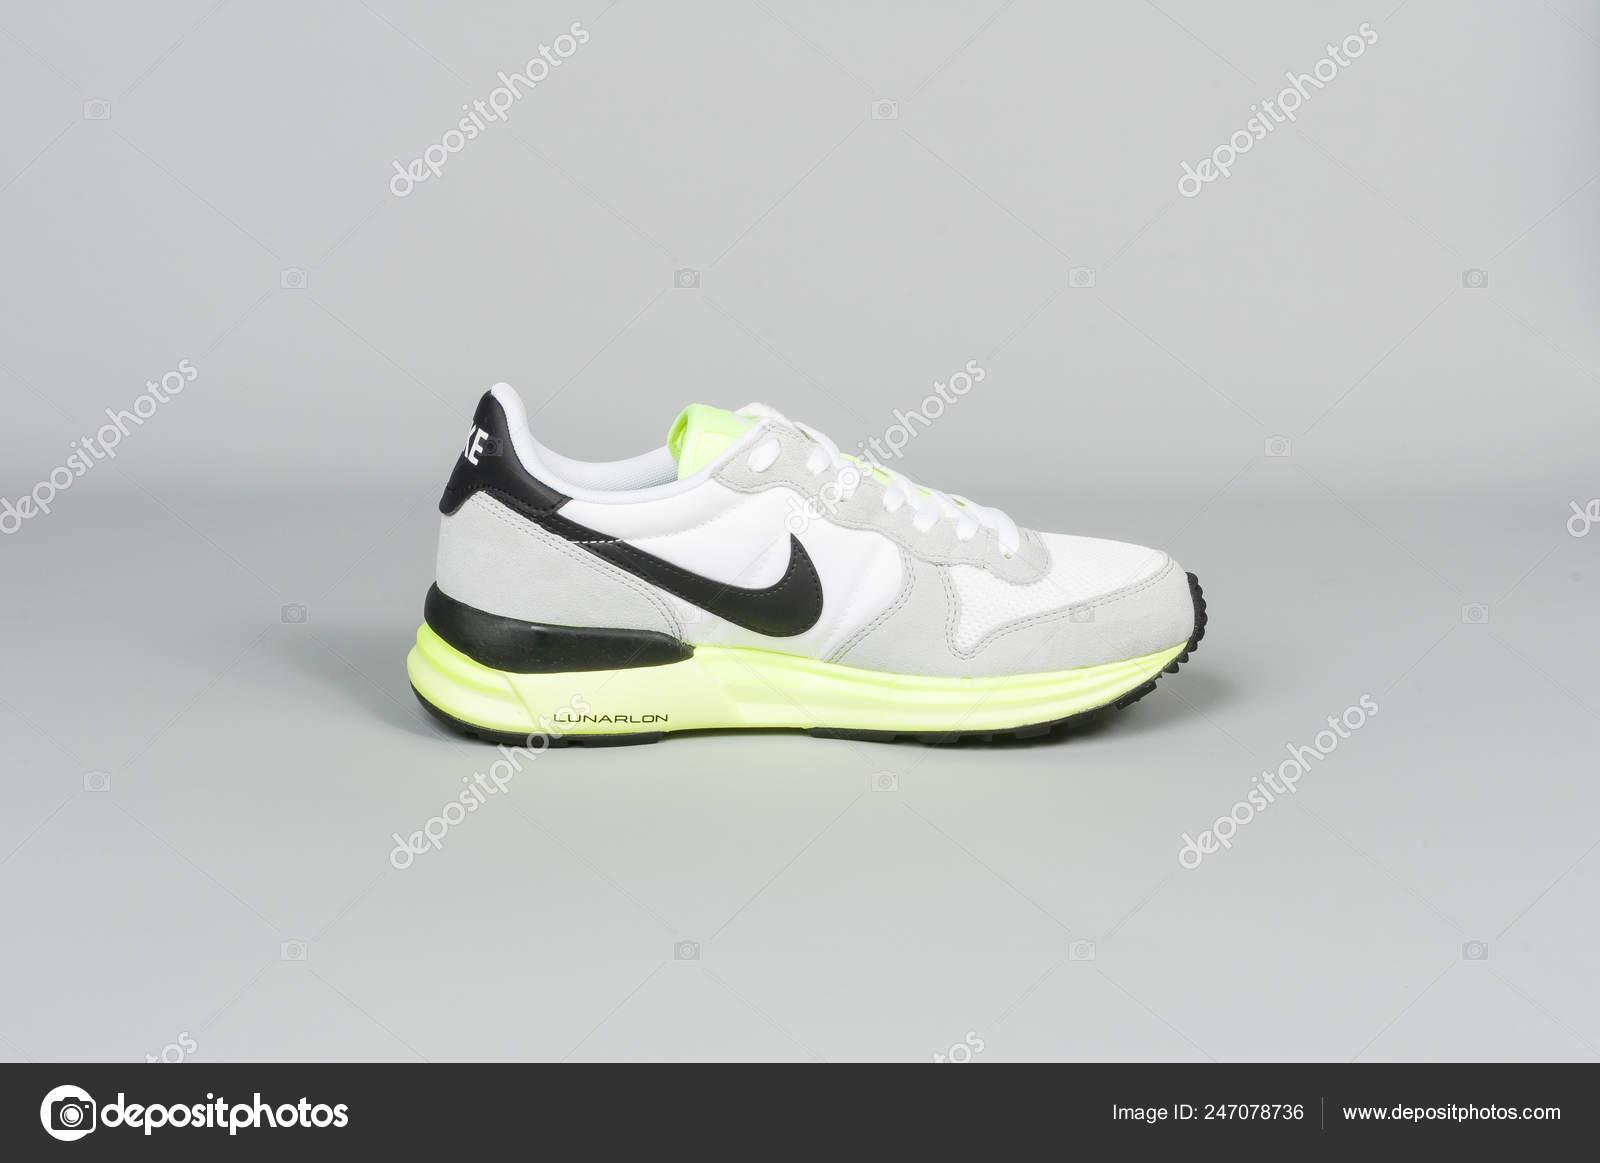 eb97d0cc92c Medellin Colômbia Fevereiro 2019 Nike Esportes Sapatos Fundo Cinza —  Fotografia de Stock